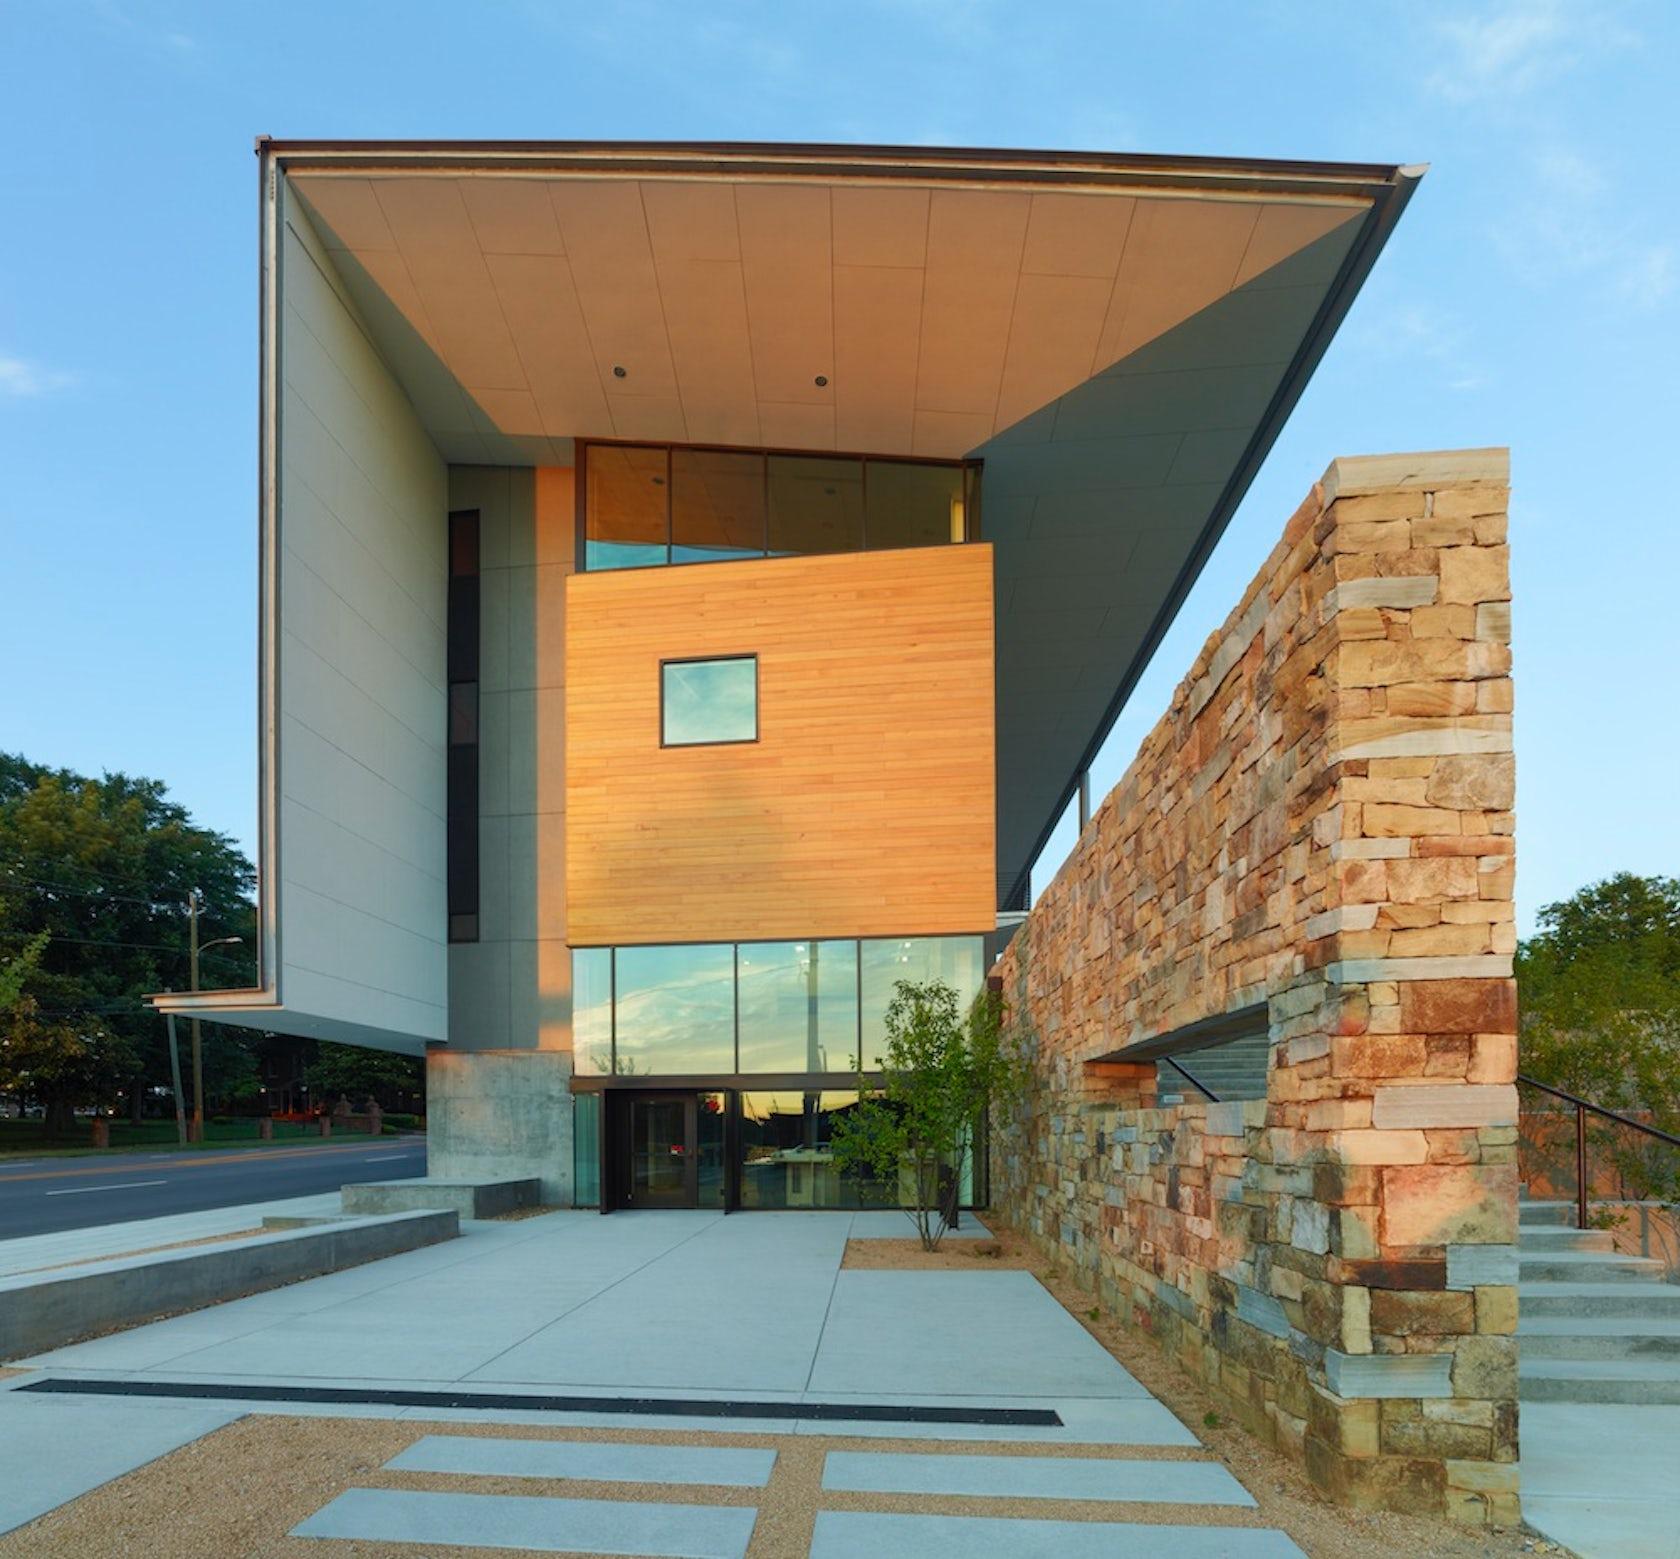 Home Design Ideas Architecture: AIANC Center For Architecture And Design